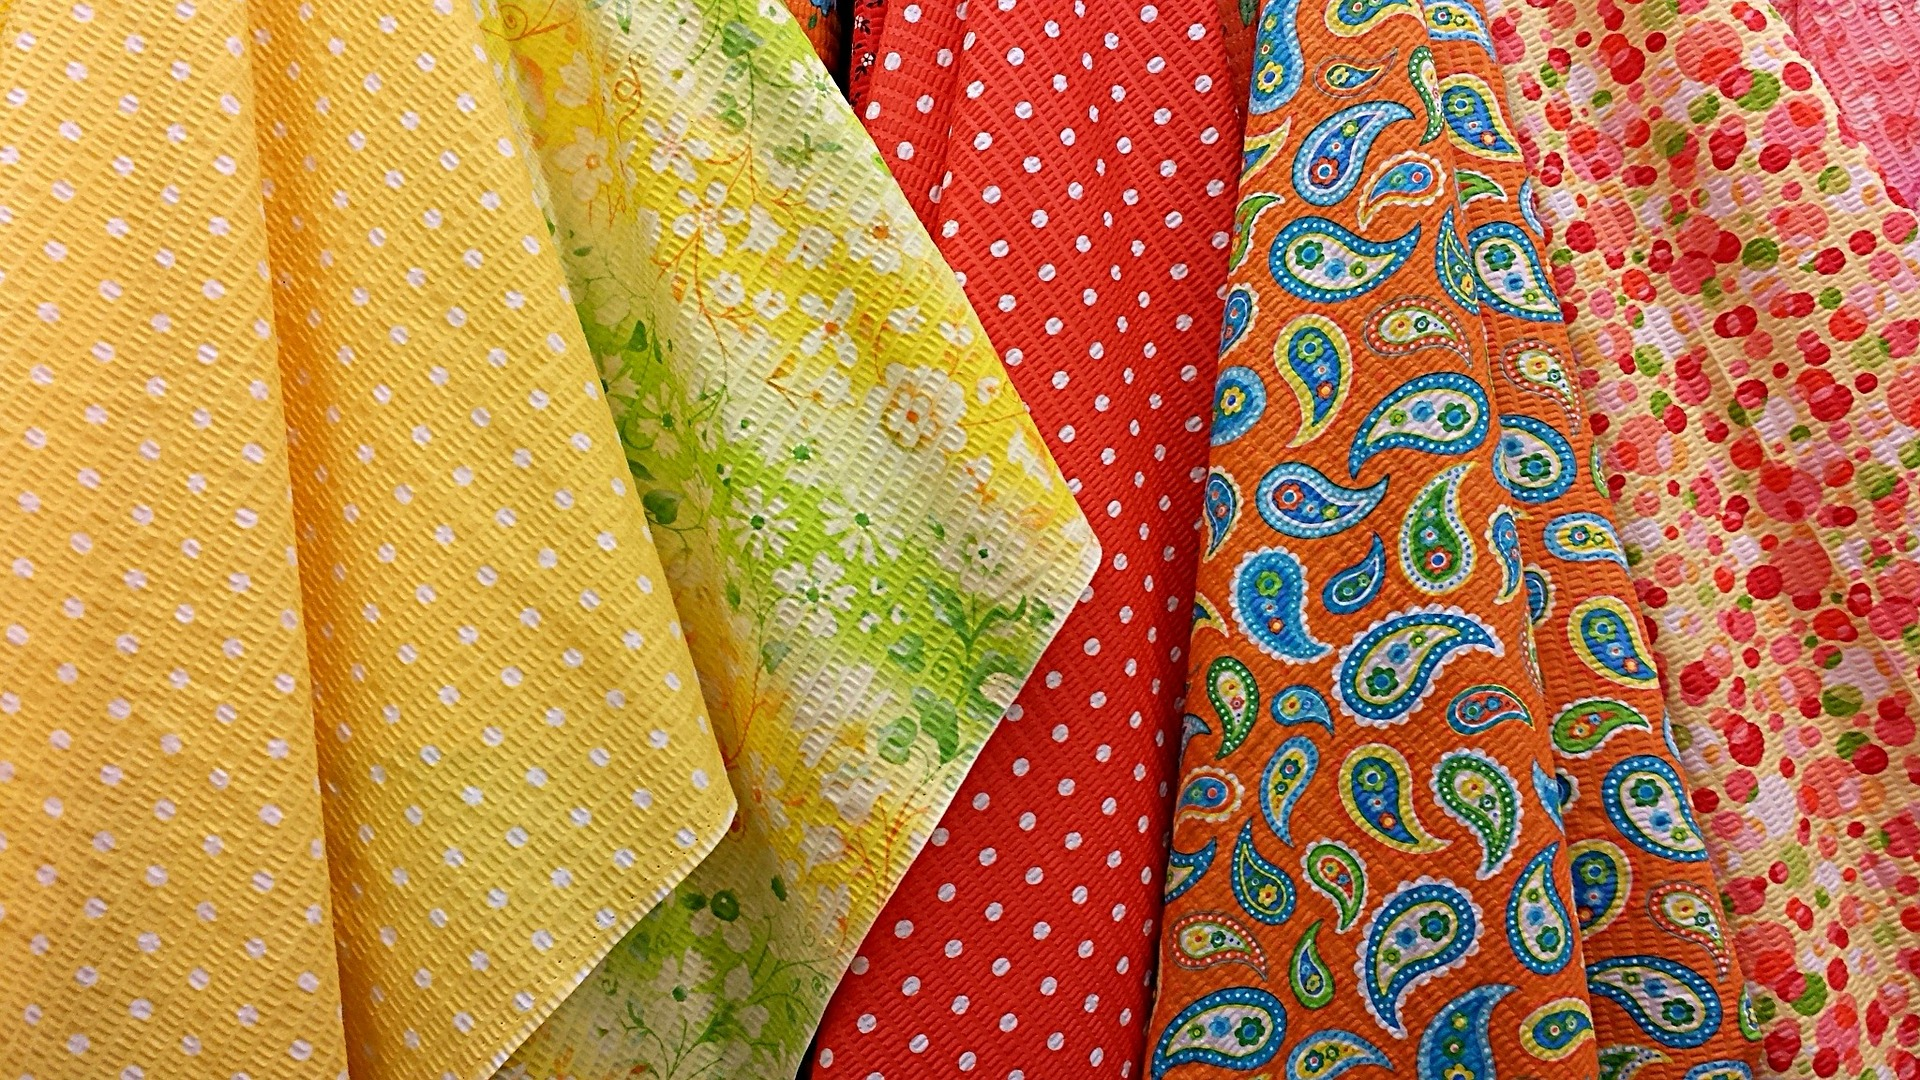 Colorful retro fabrics